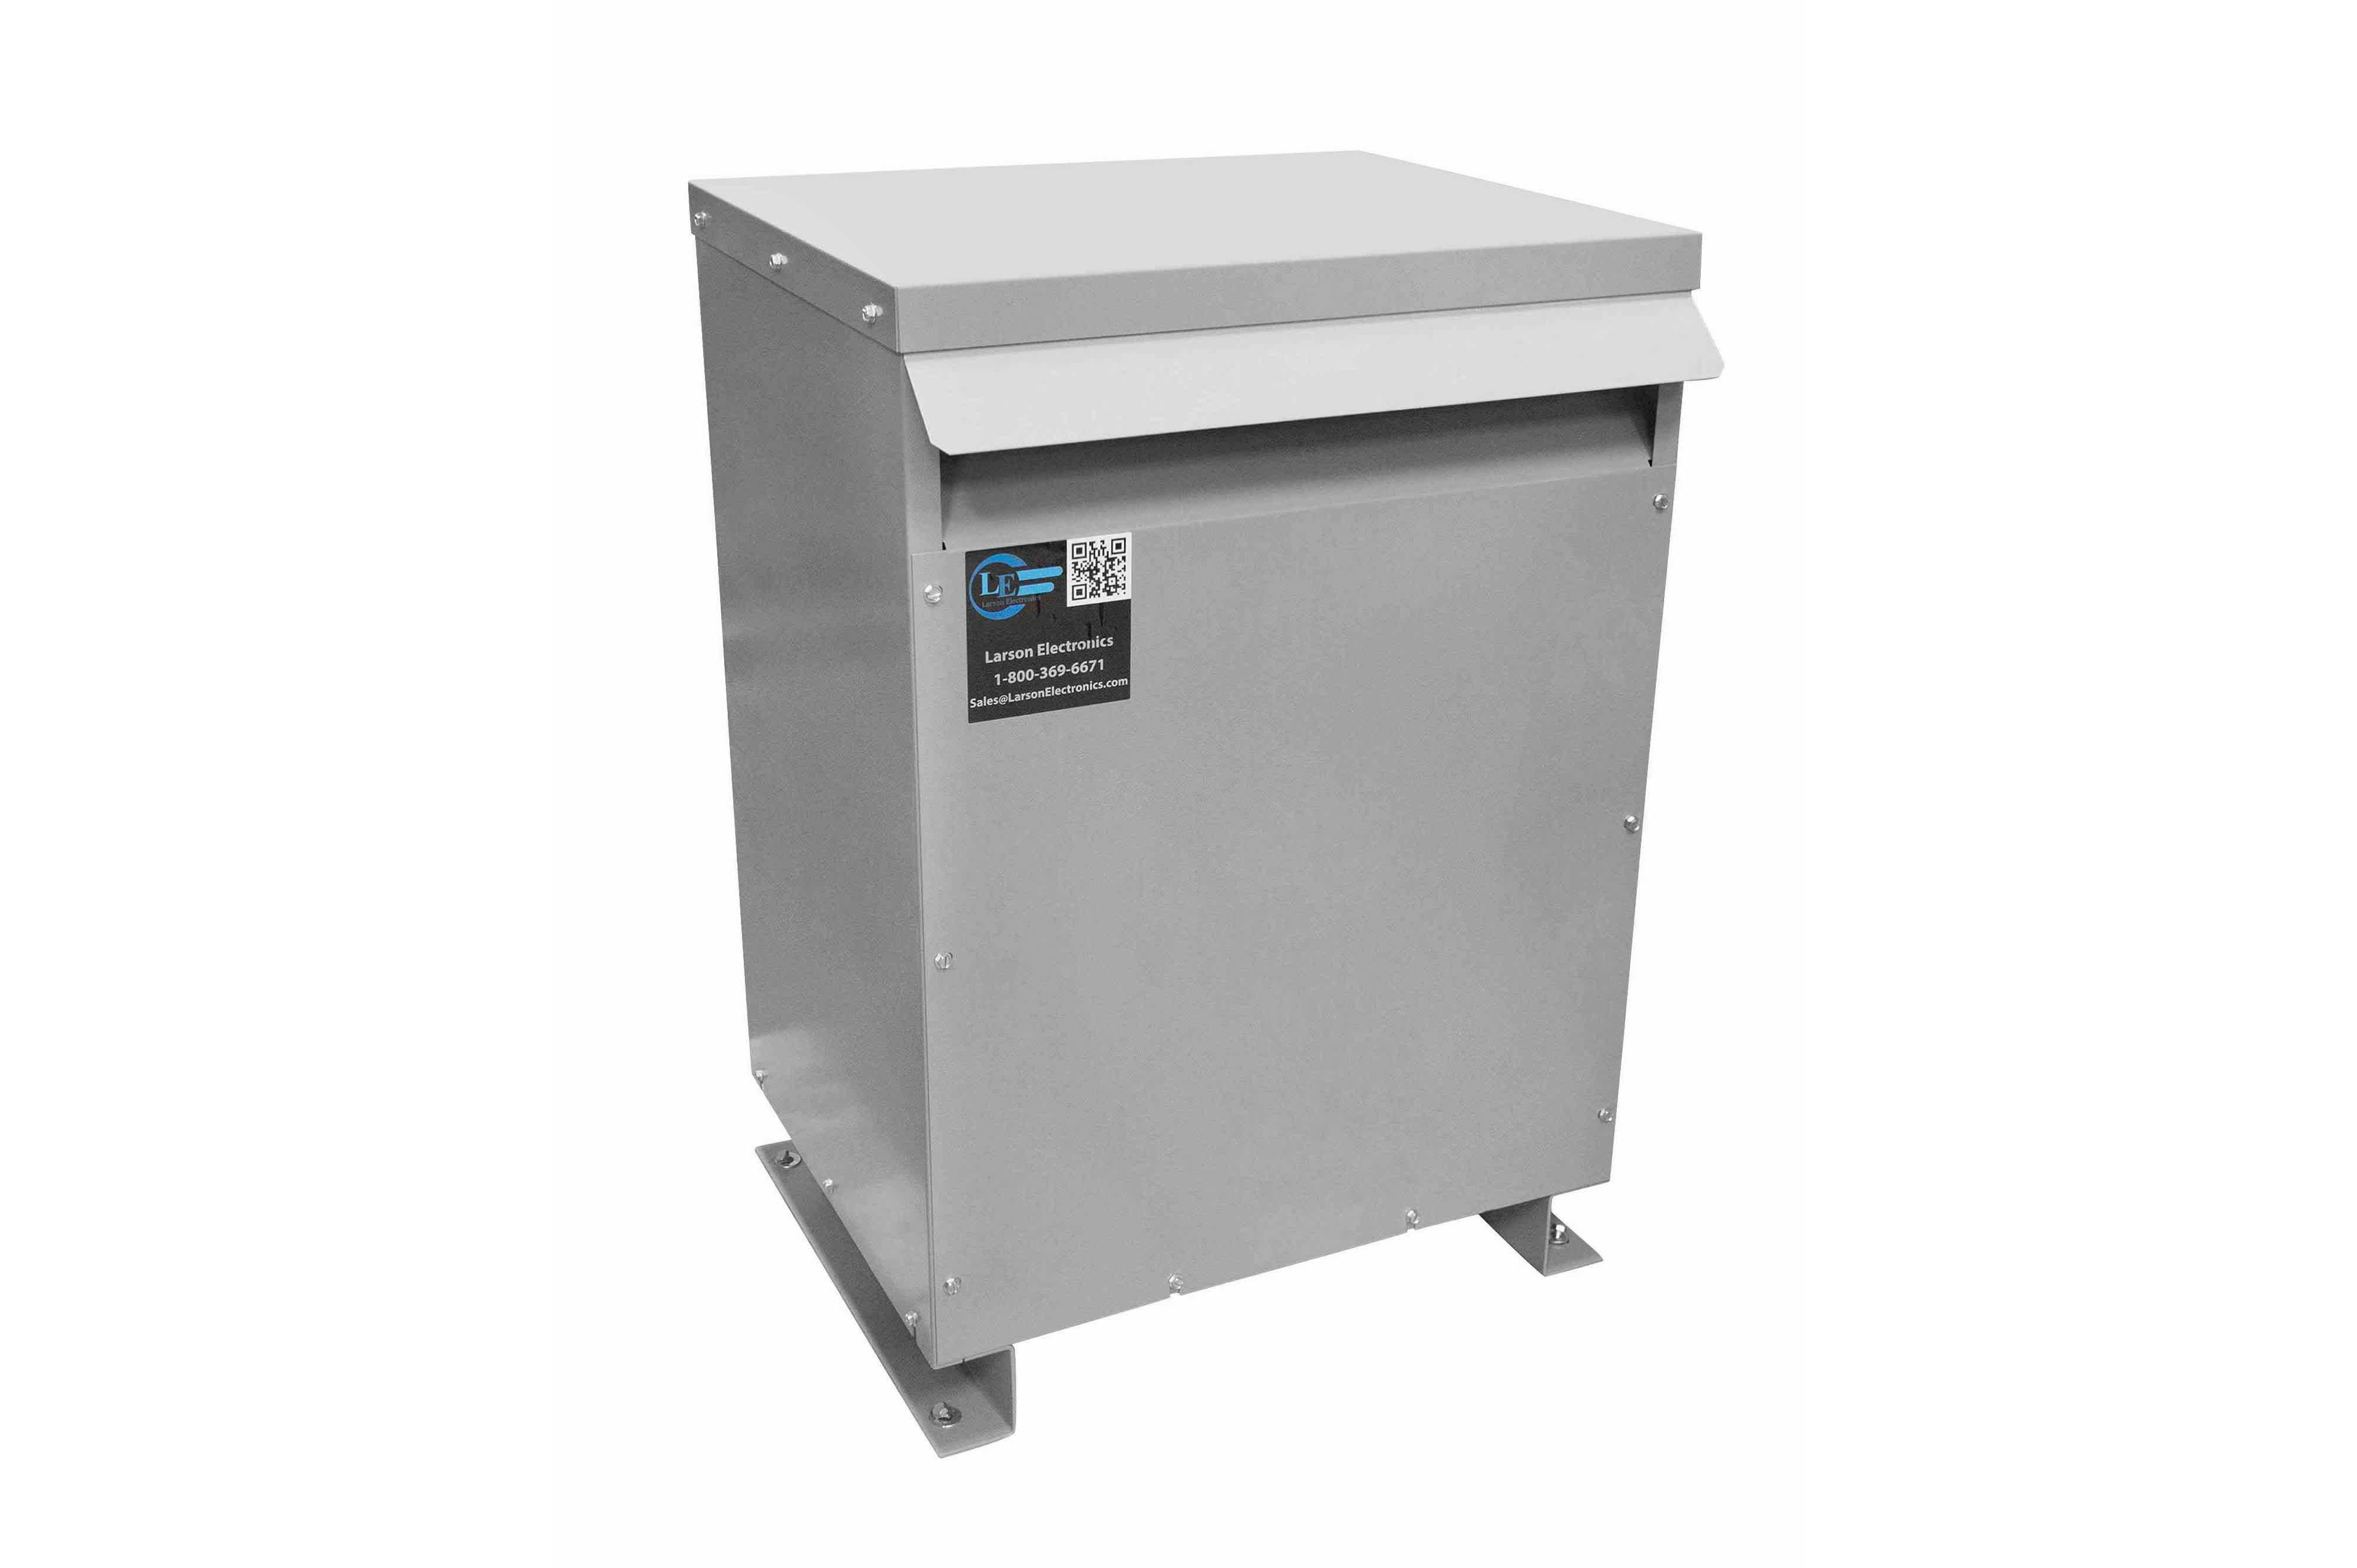 200 kVA 3PH DOE Transformer, 460V Delta Primary, 400Y/231 Wye-N Secondary, N3R, Ventilated, 60 Hz